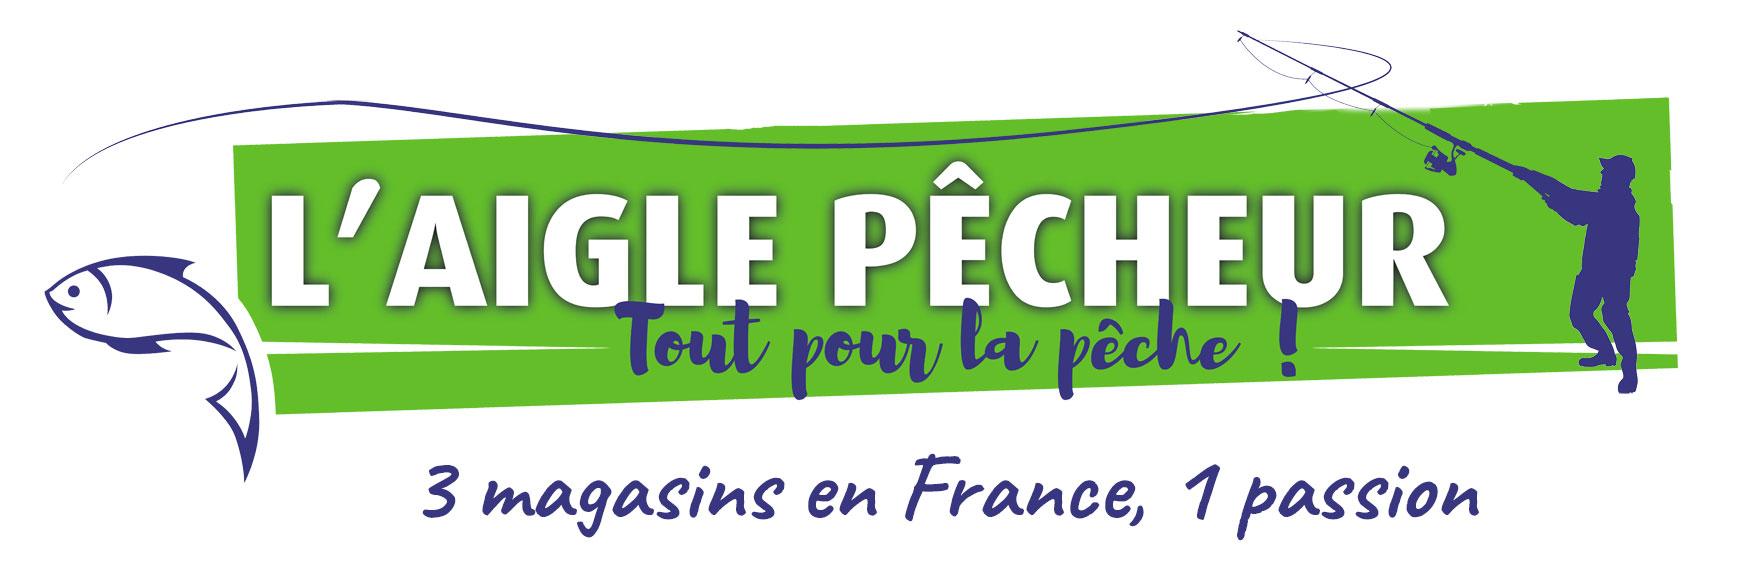 L'AIGLE PECHEUR